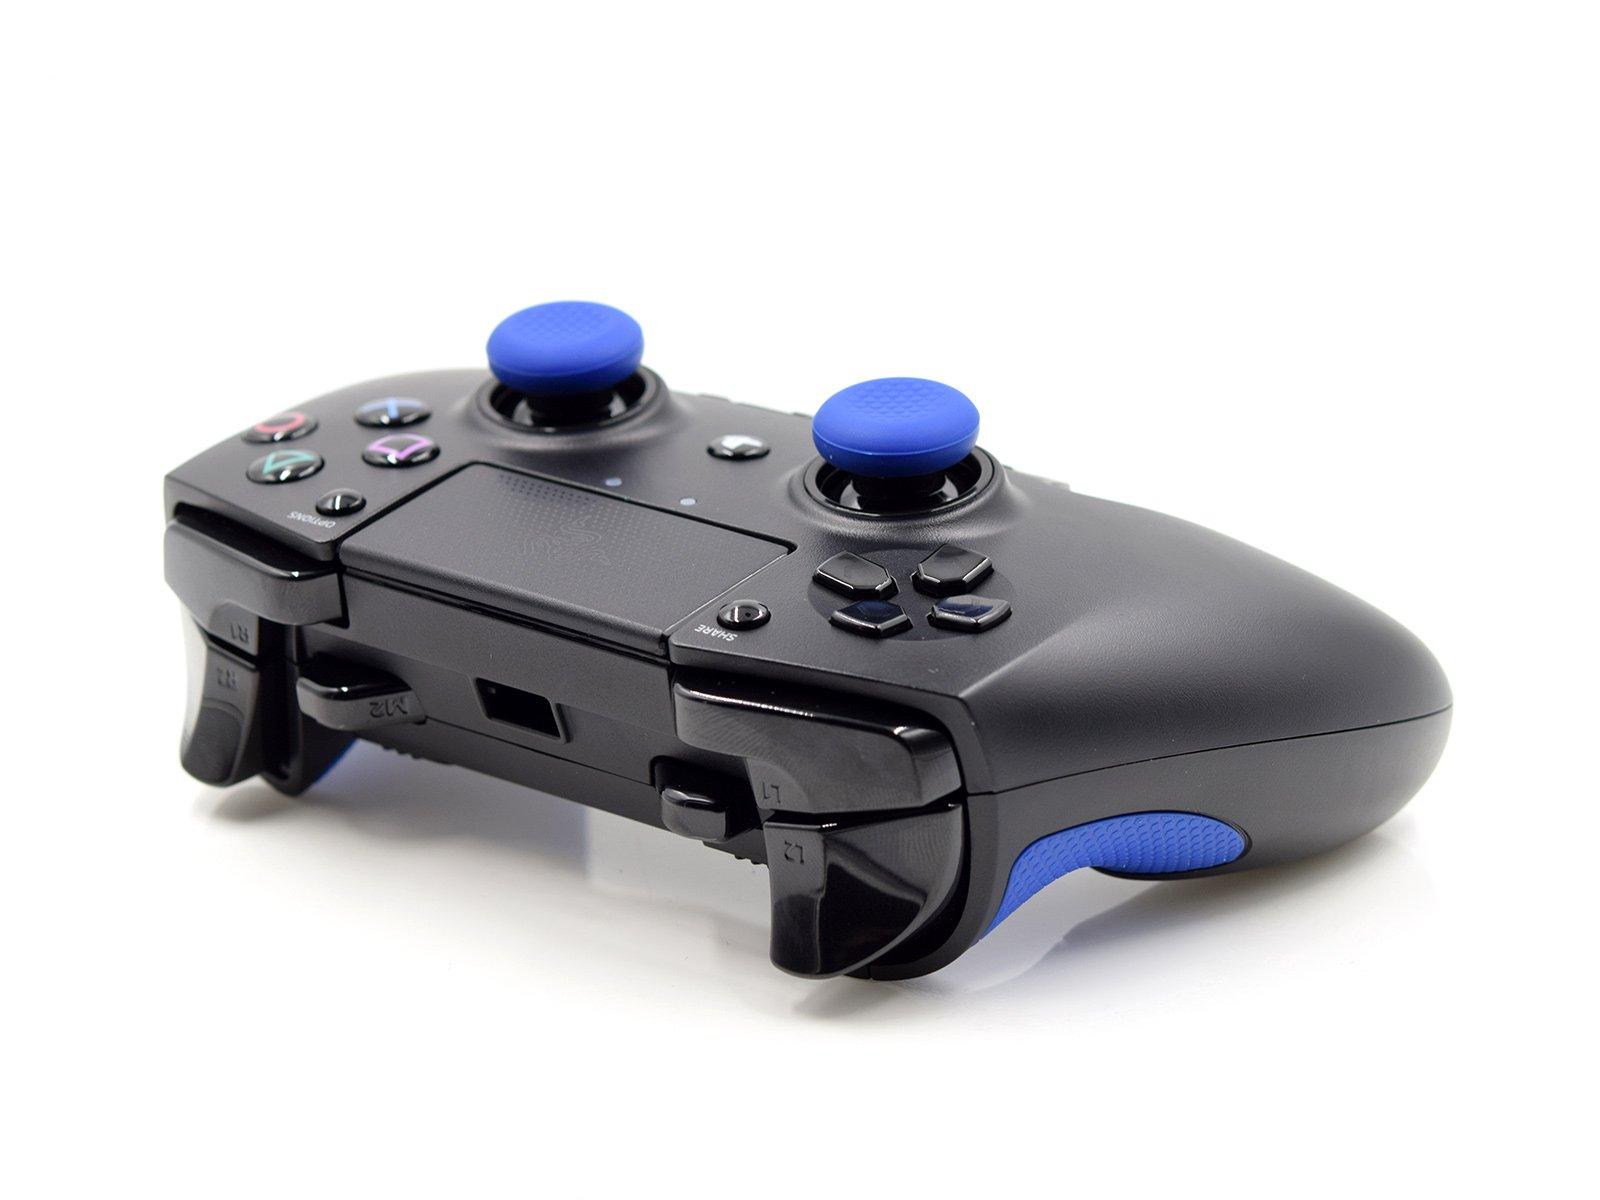 Officially Licensed Razer Raiju Controller For PS4